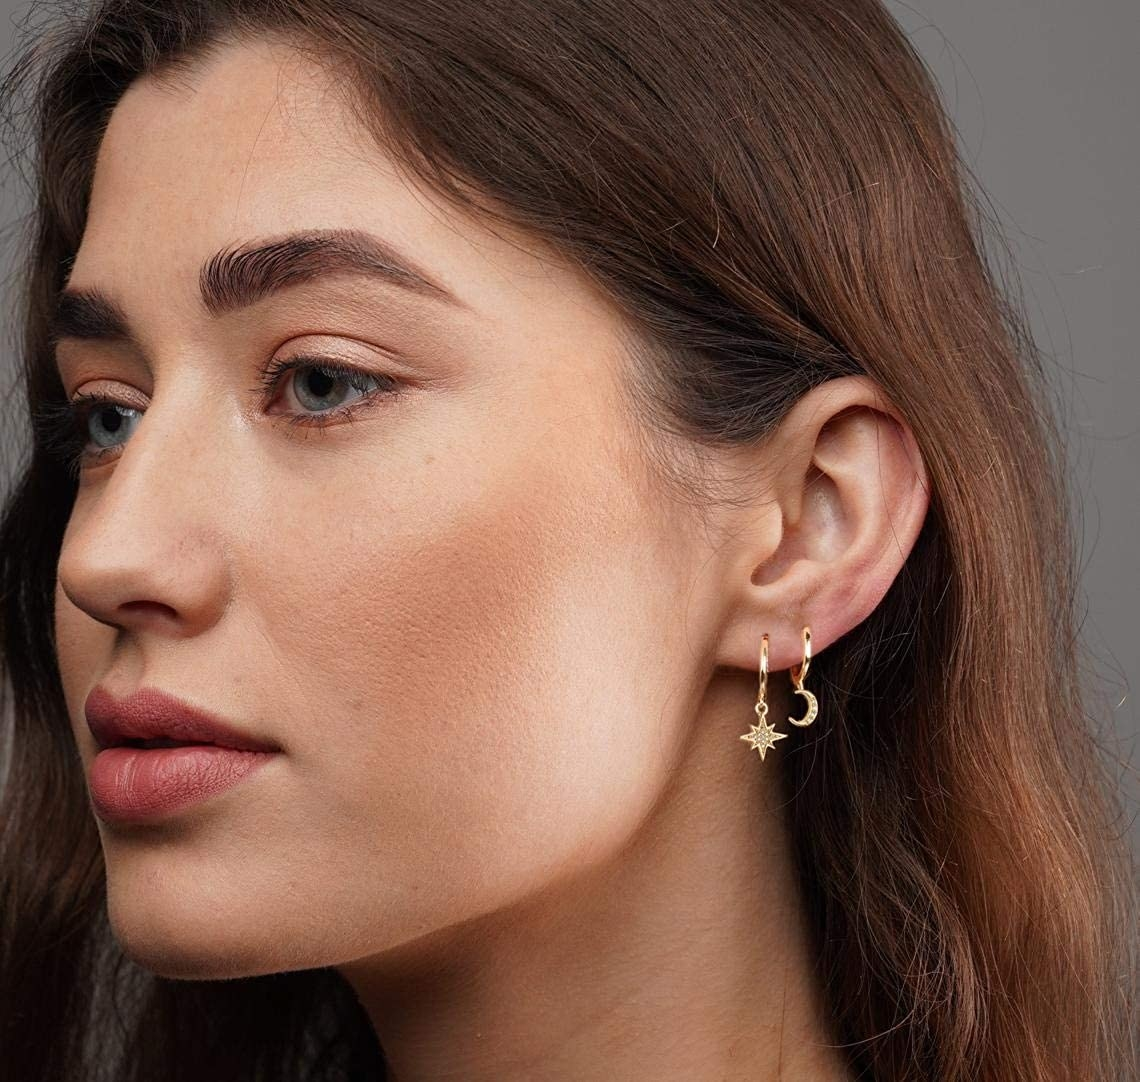 Model wearing star and moon-shaped earrings